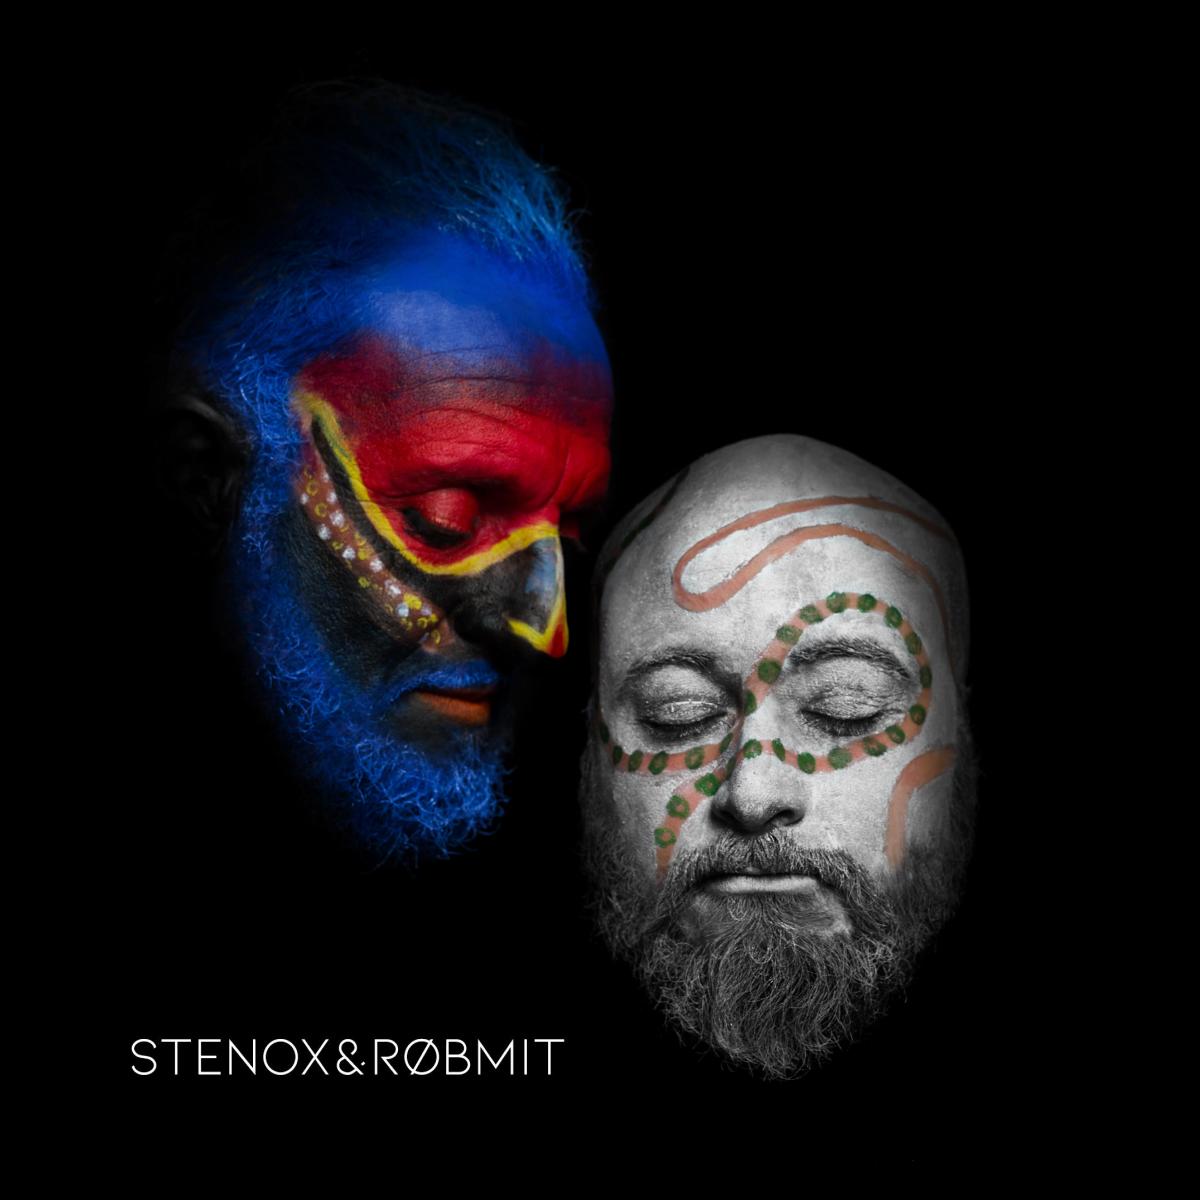 Music and lyrics by Stenox and RØbmit